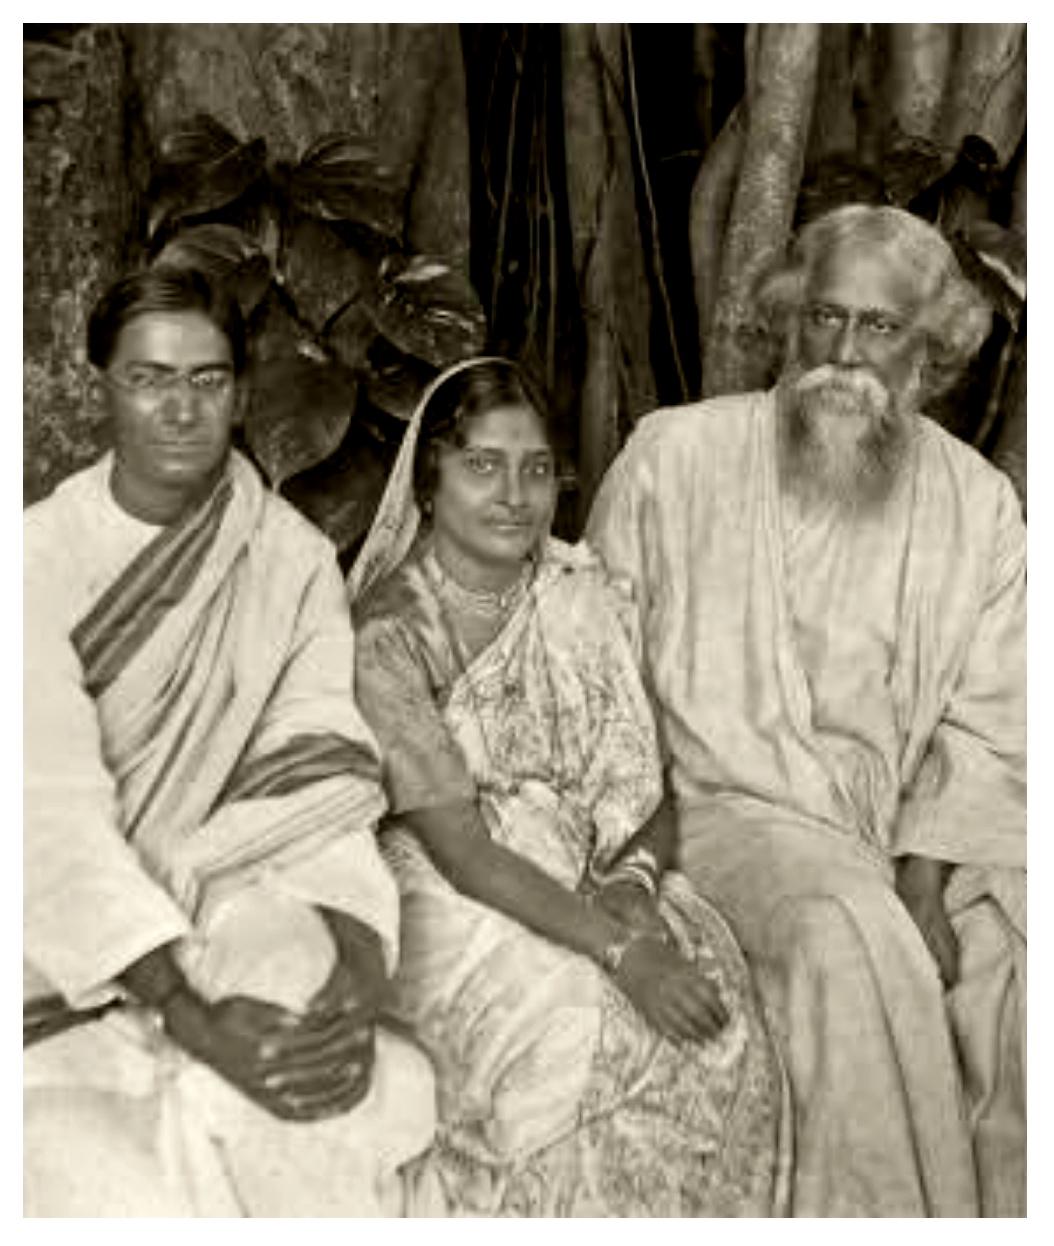 Rabindranath Tagore with P. C. Mahalanobis and Nirmalkumari Mahalanobis